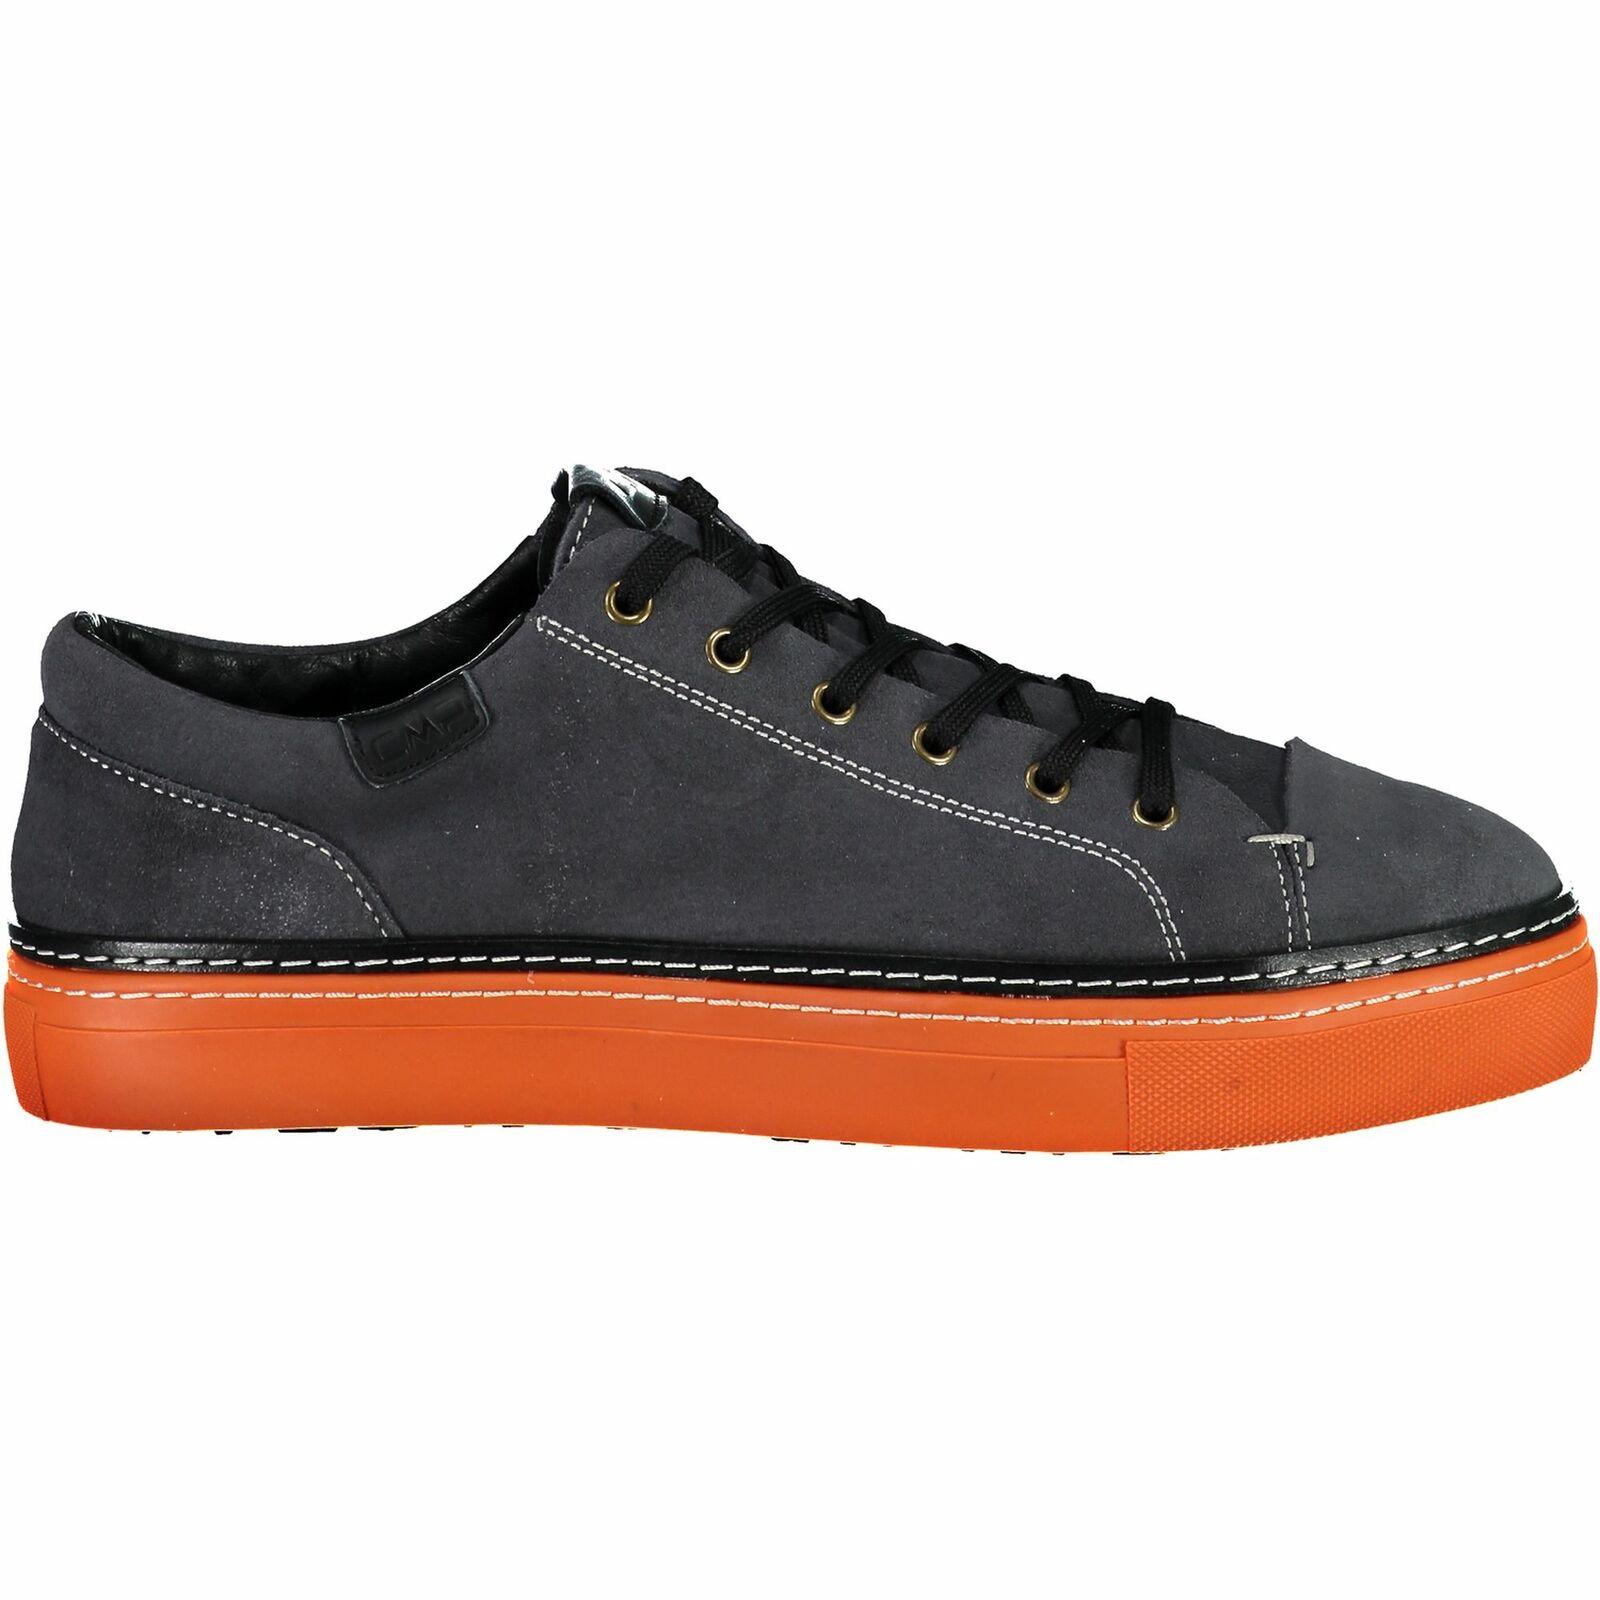 CMP cortos Libertas Lifestyle zapatos gris monocromo serraje transpirable suela